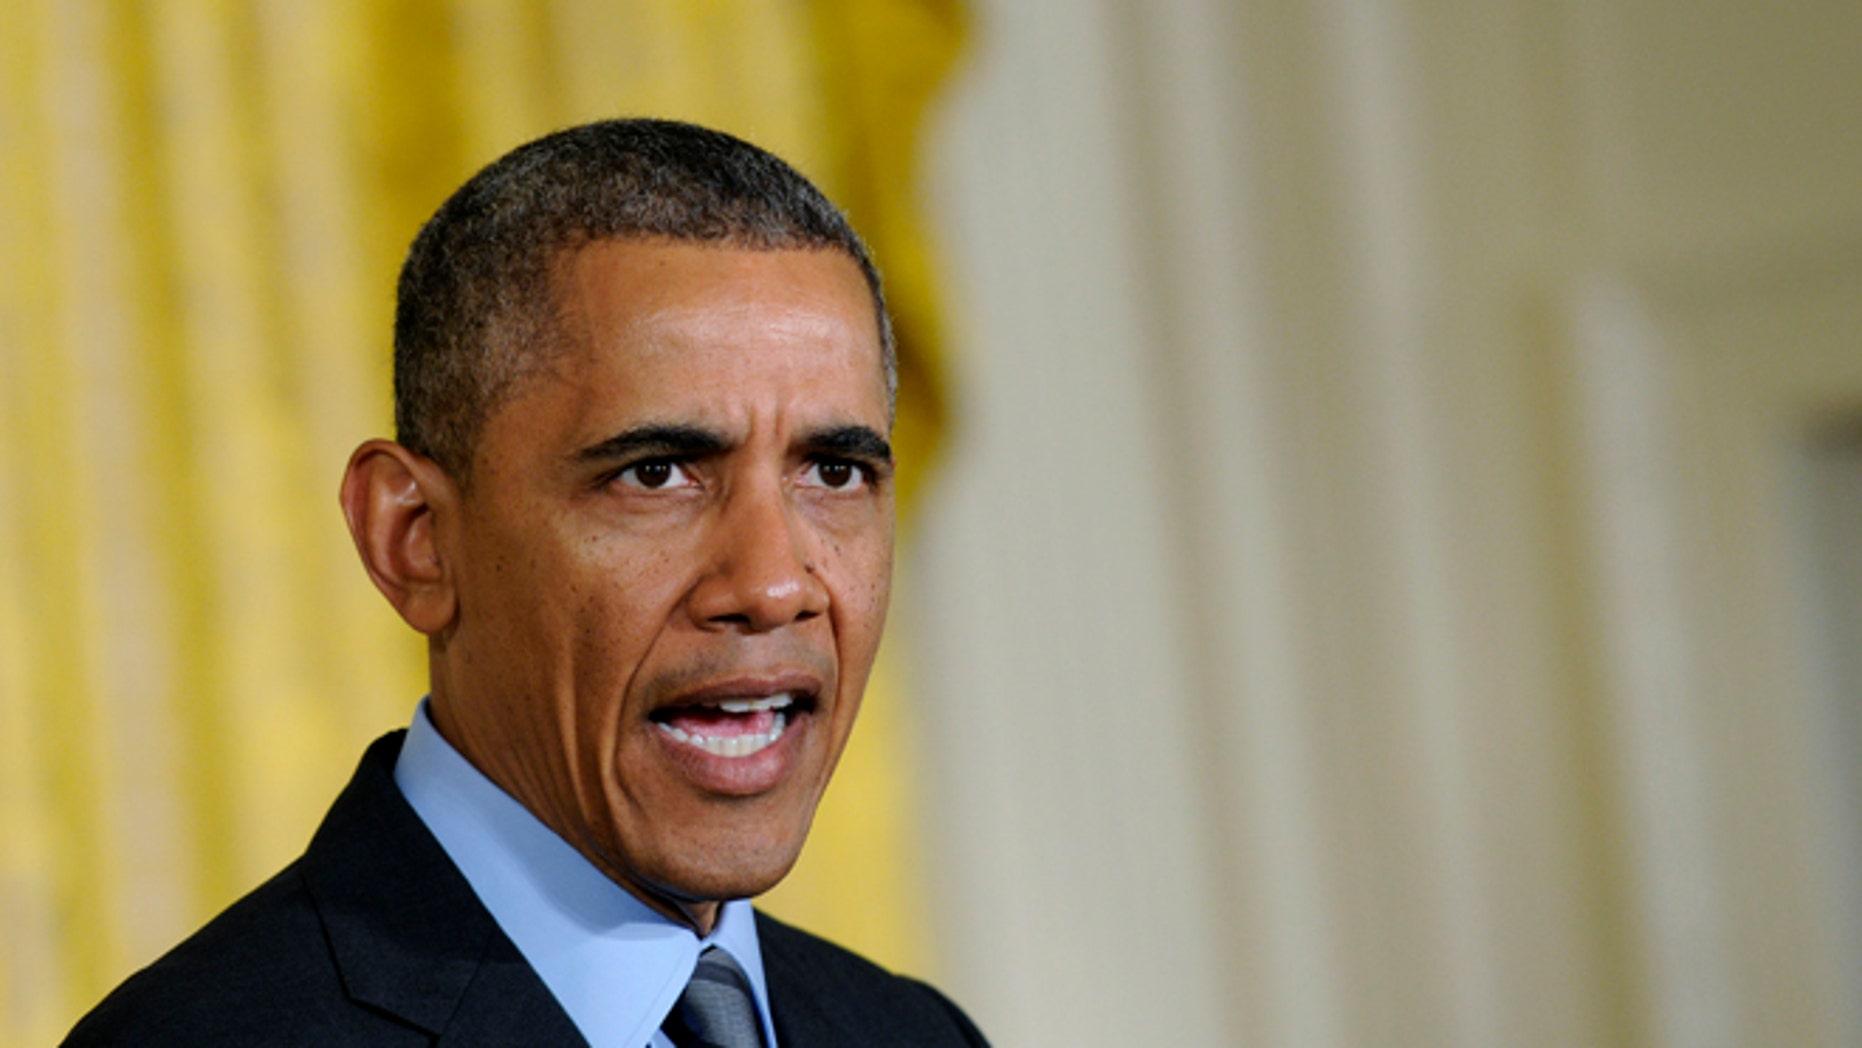 FILE -- President Barack Obama speaks in the East Room of the White House in Washington, Thursday, May 29, 2014.